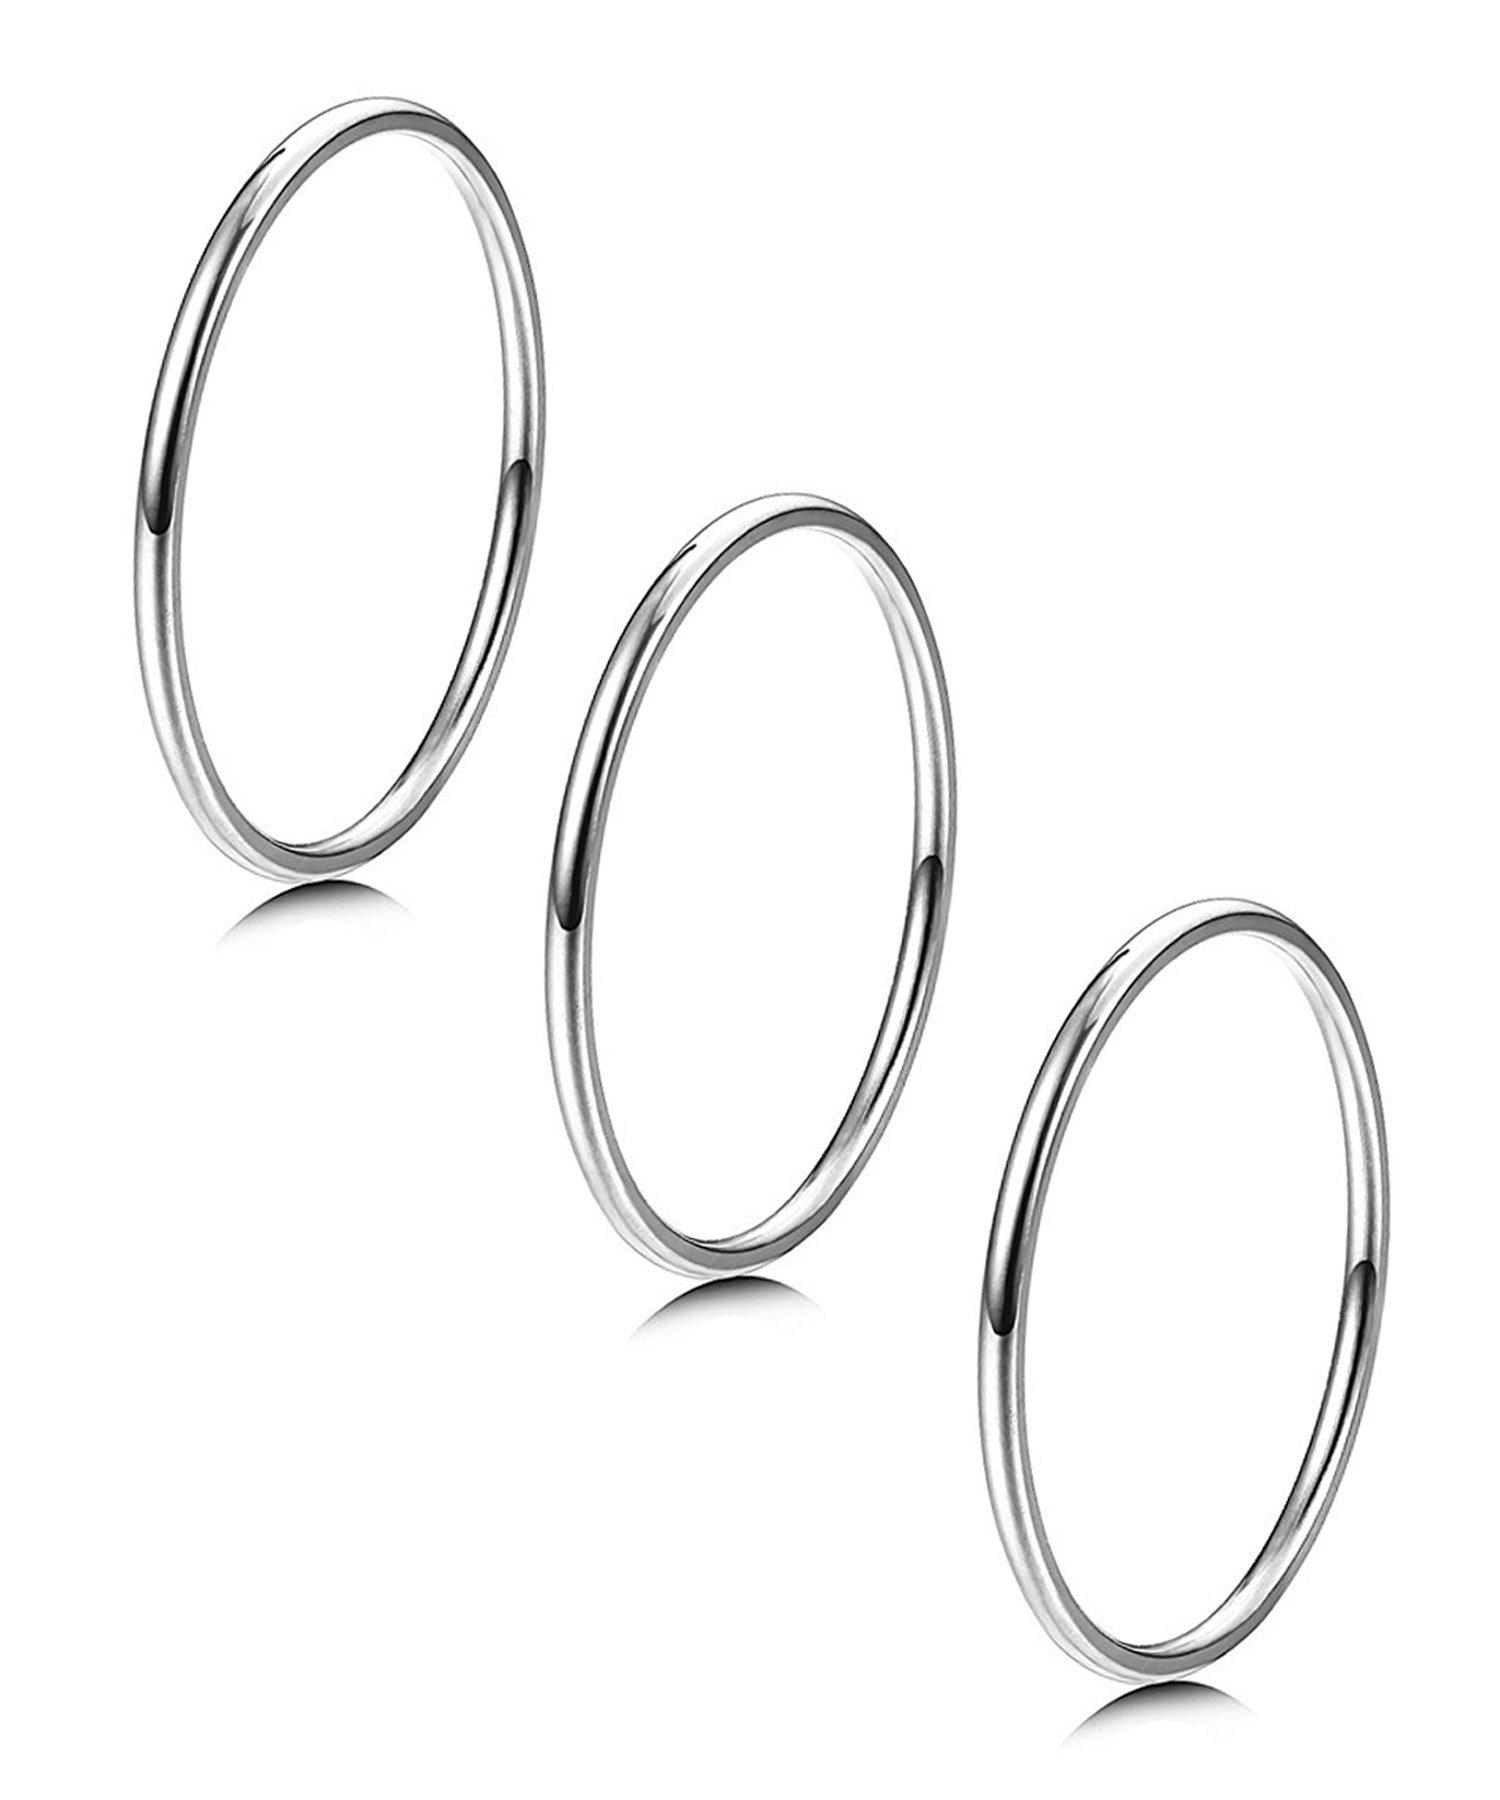 ویکالا · خرید  اصل اورجینال · خرید از آمازون · LOYALLOOK 3pcs 1mm Stainless Steel Women's Plain Band Knuckle Stacking Midi Rings Comfort Fit Silver Tone 8# wekala · ویکالا